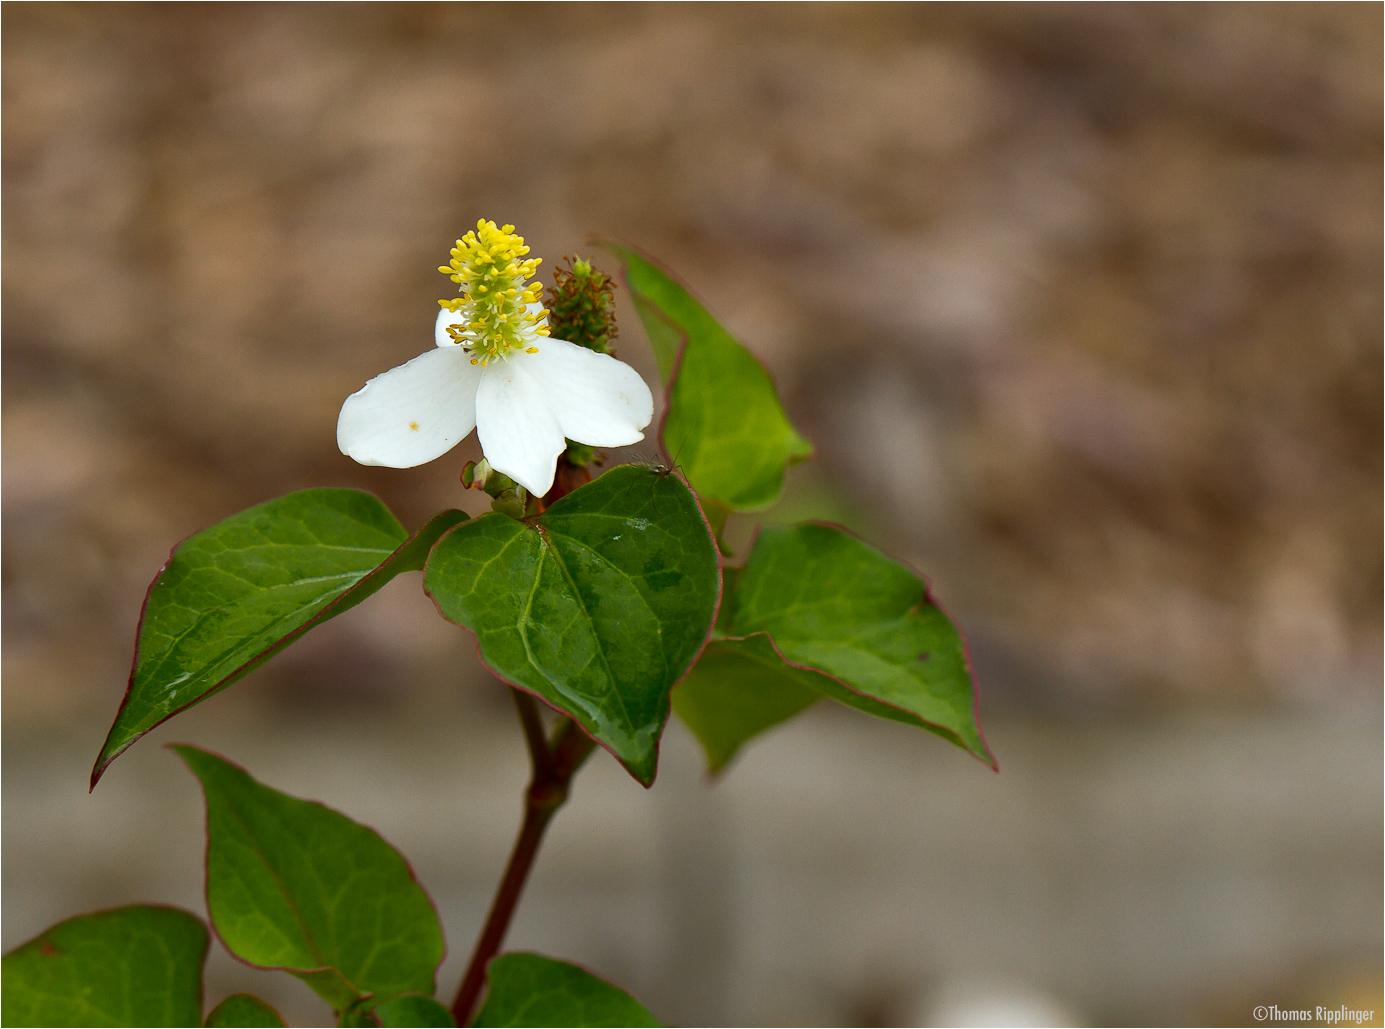 Molchschwanz (Houttuynia cordata)